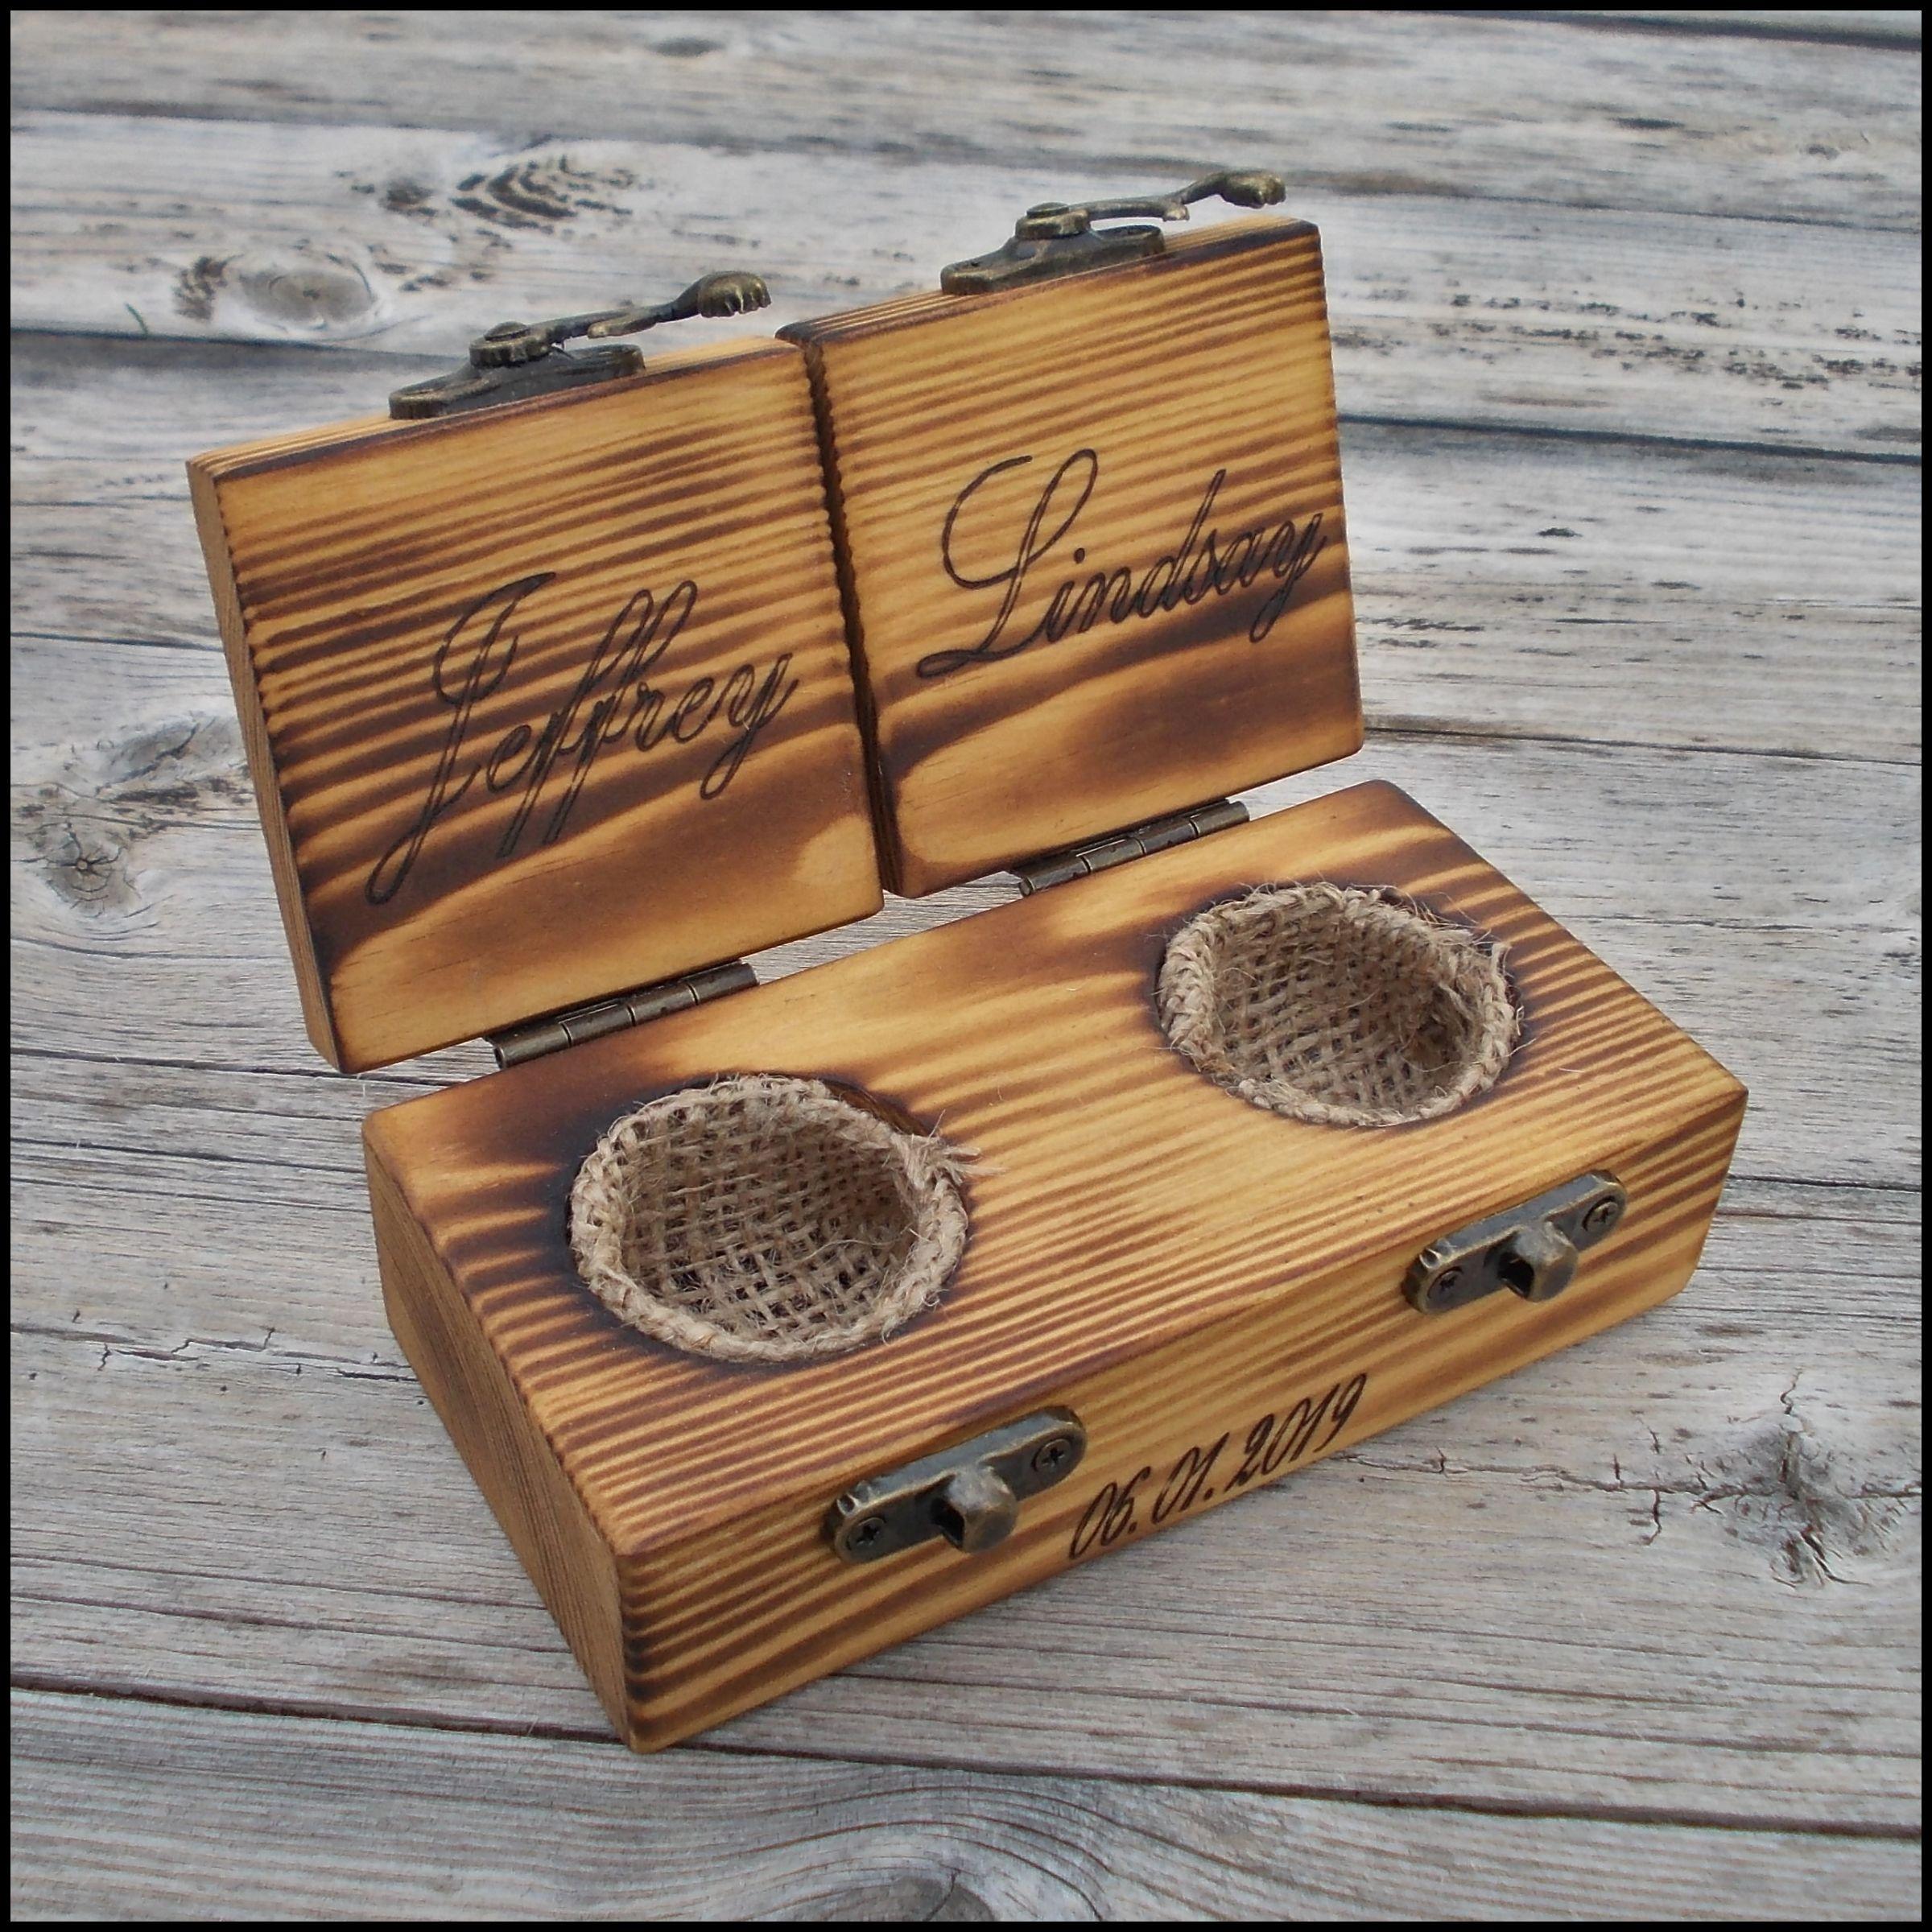 Ring Bearer Box Wedding Ring Box Wedding Ring Holder Rustic Wood Ring Box Vintage Wood Ring Box Proposal Ring Box Wedding Ring Holder Wood Ring Box Wedding Wooden Ring Box Wedding